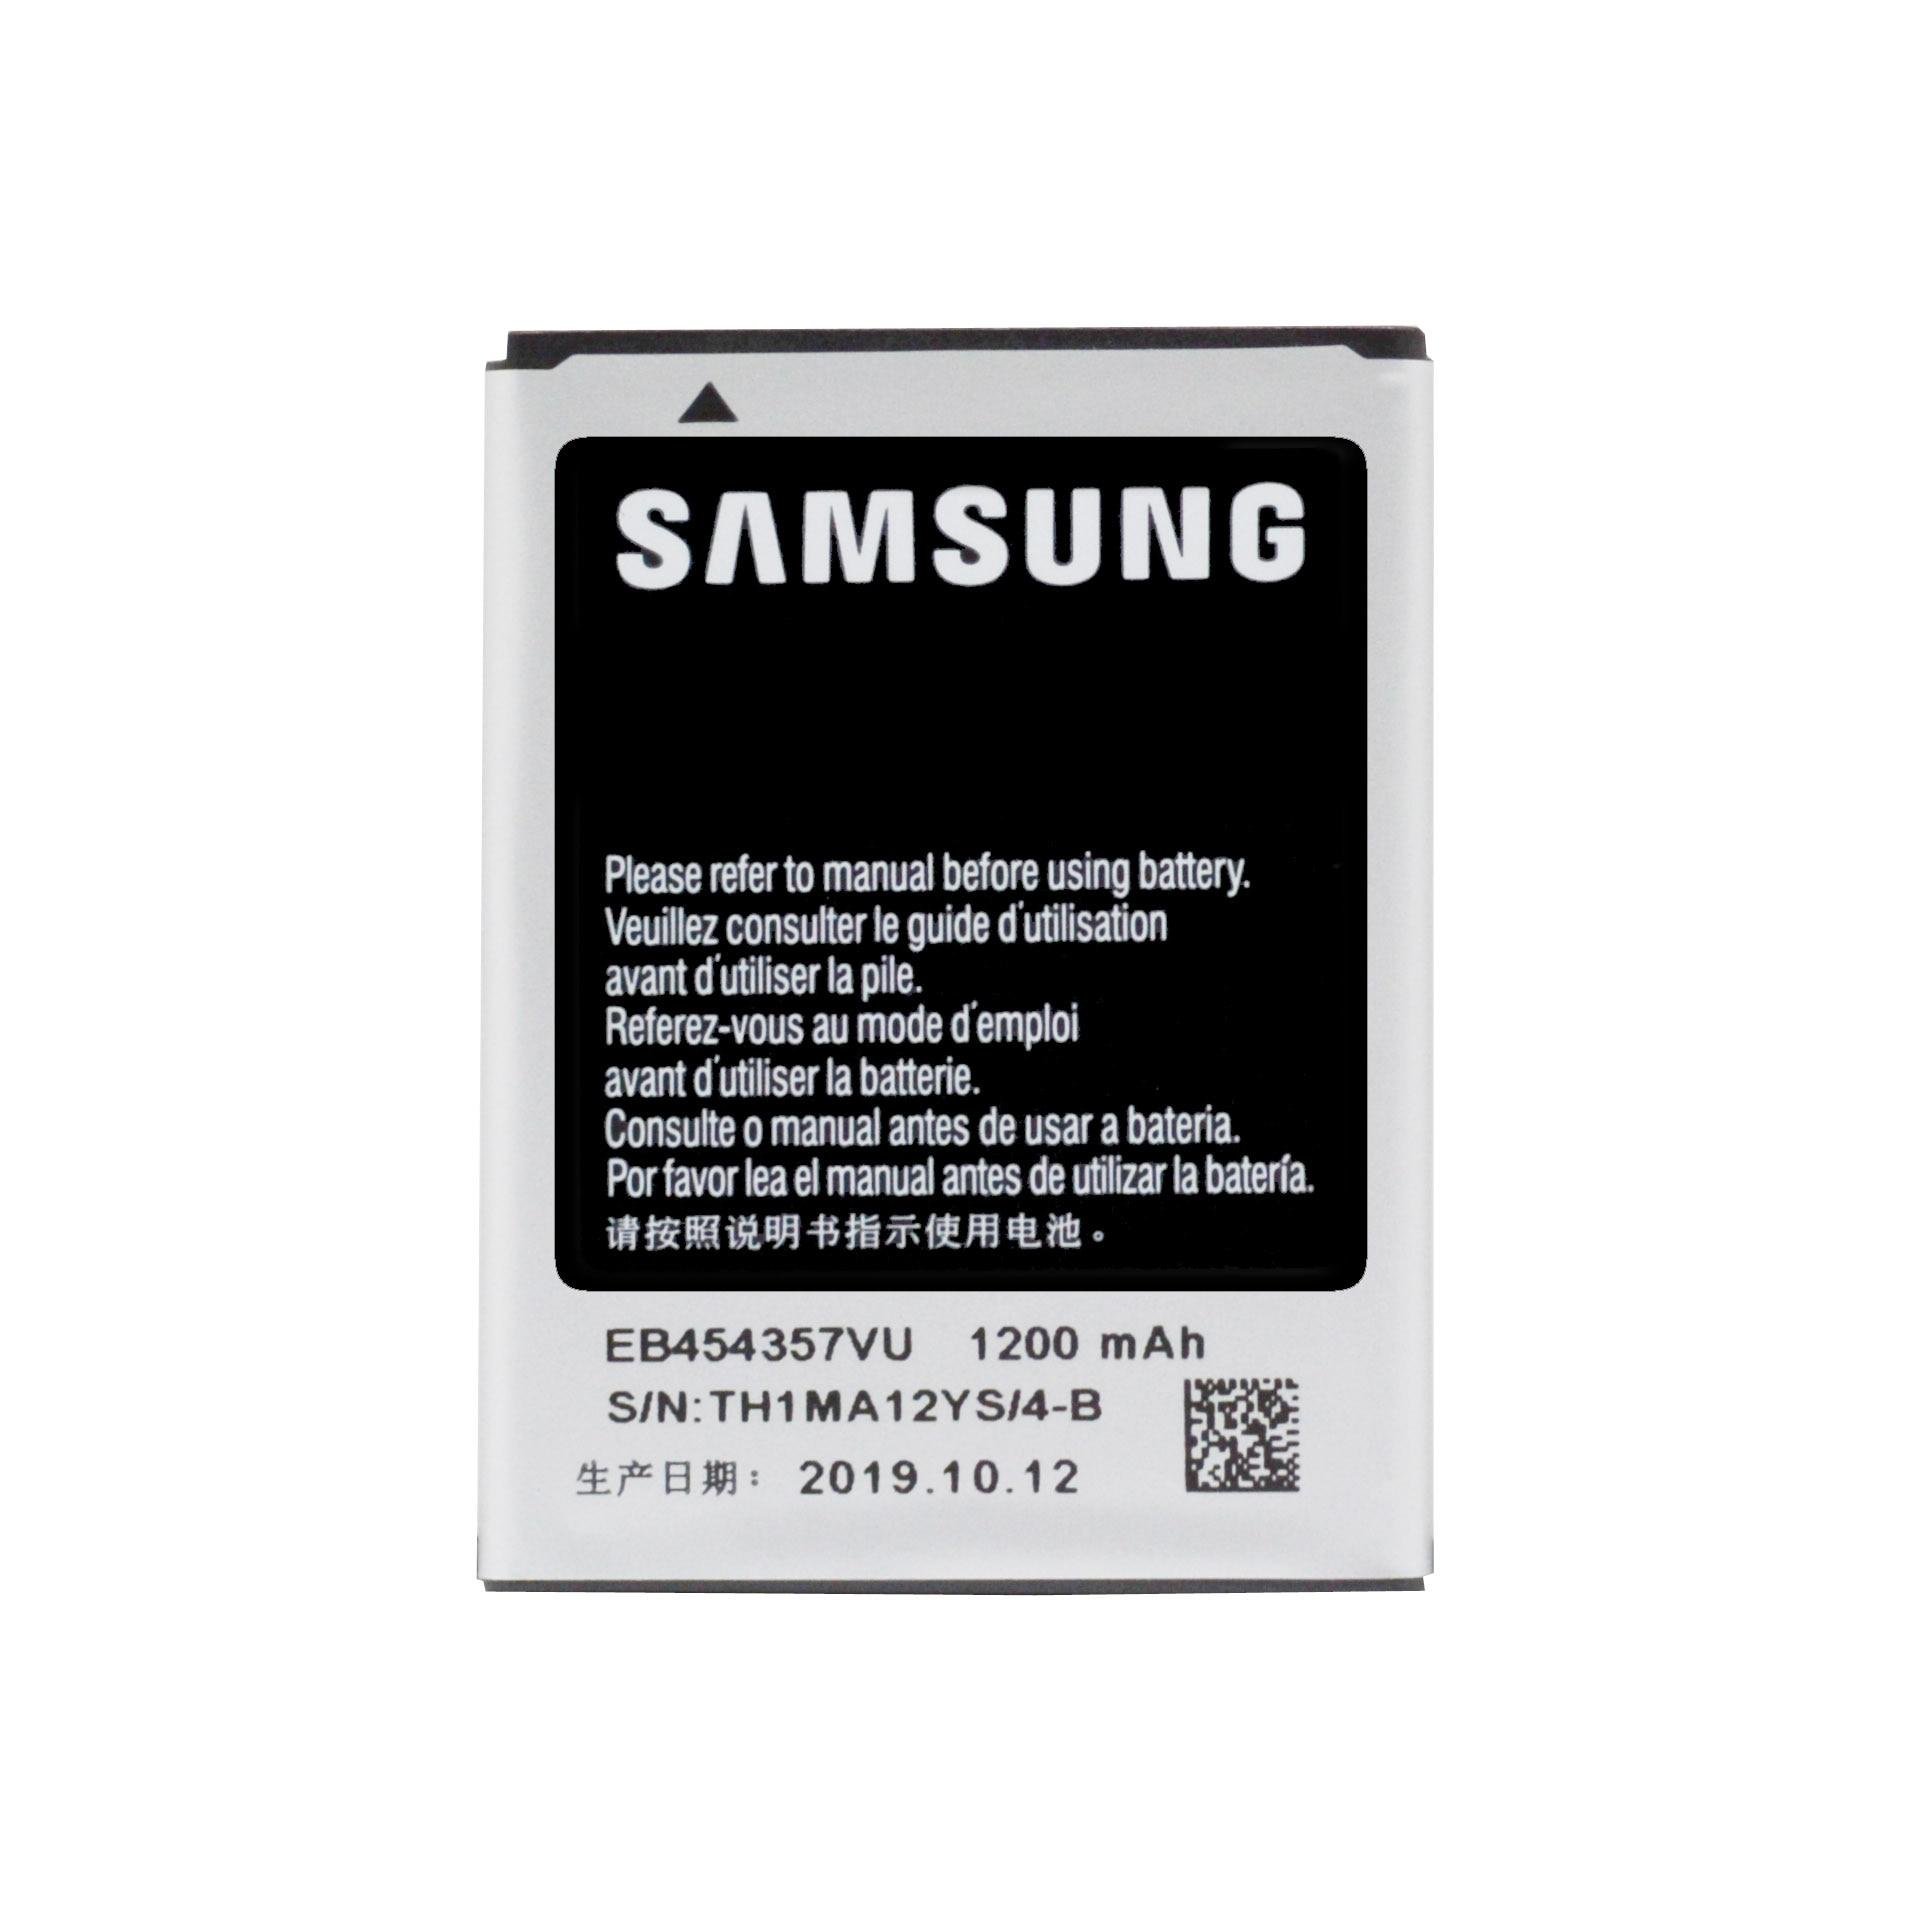 20pcs/lot Original Battery EB454357VU For Samsung Galaxy Y S5360 Y Pro B5510 Wave S5380 Pocket S5300 Chat B5330 1200mAh enlarge